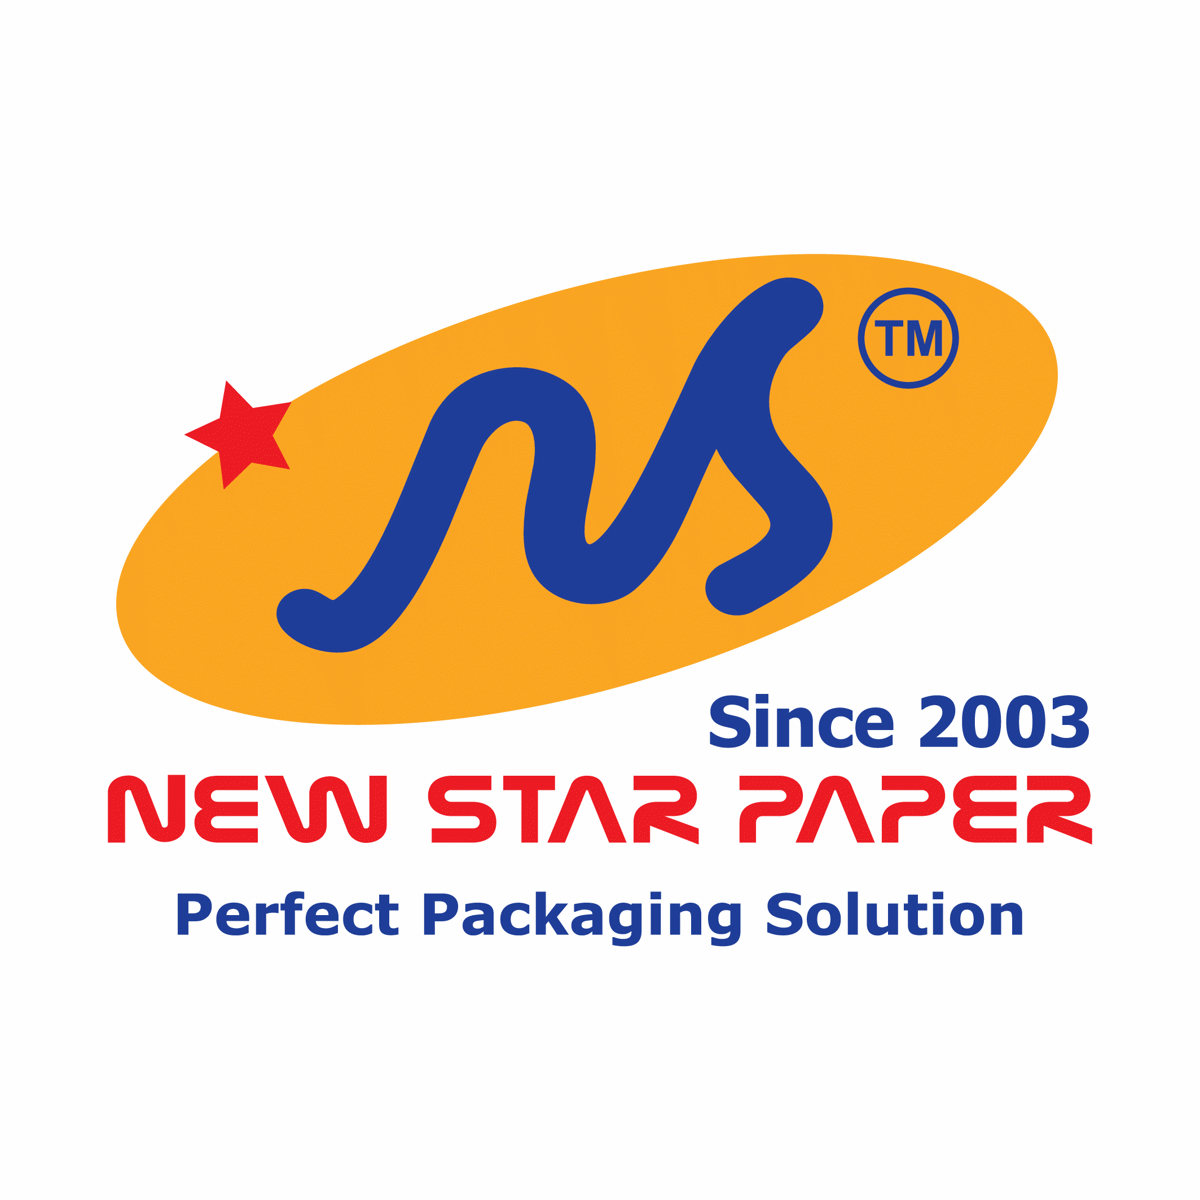 NewStarPaper